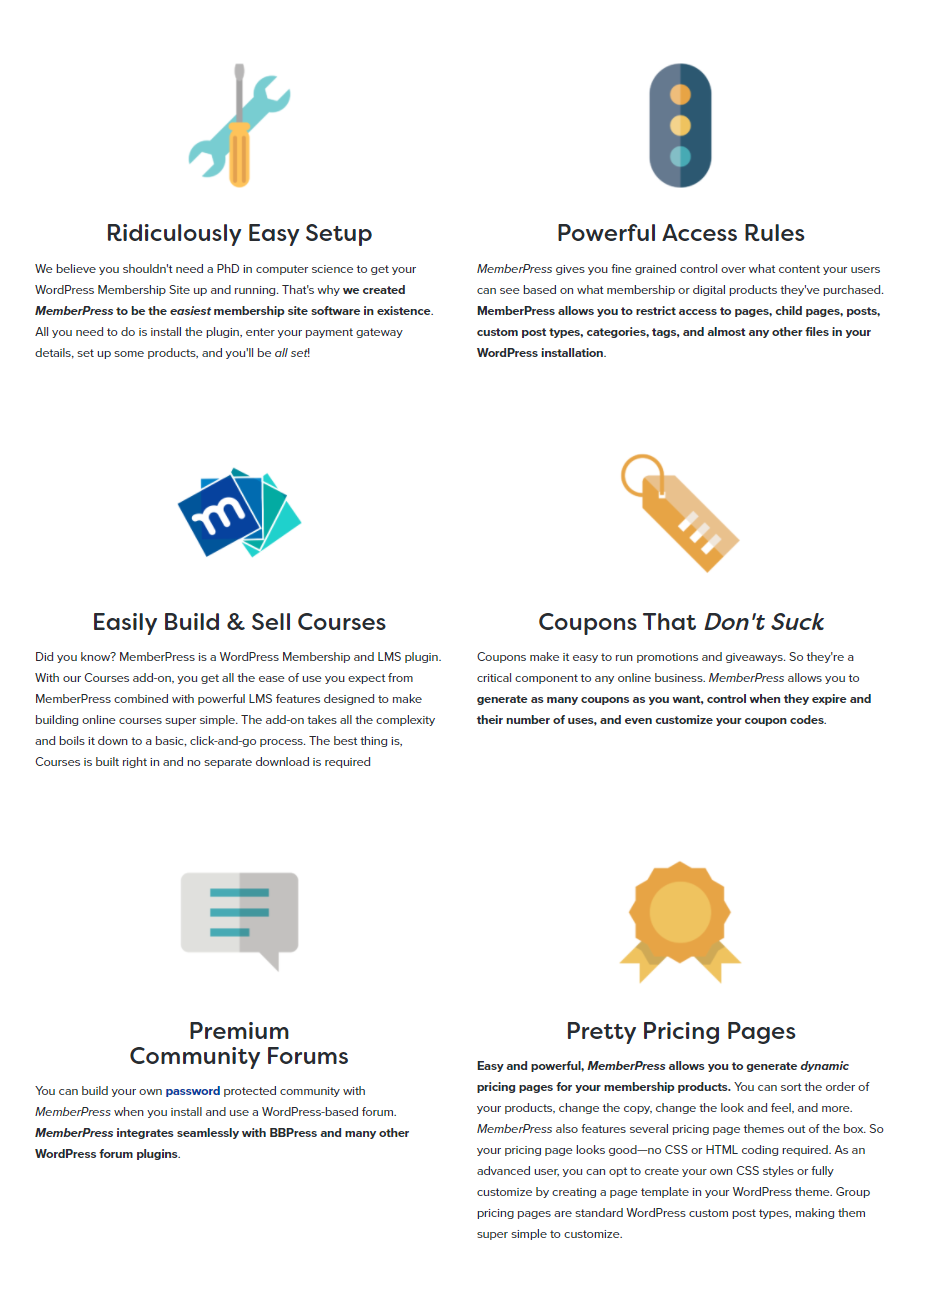 -MemberPress- Features